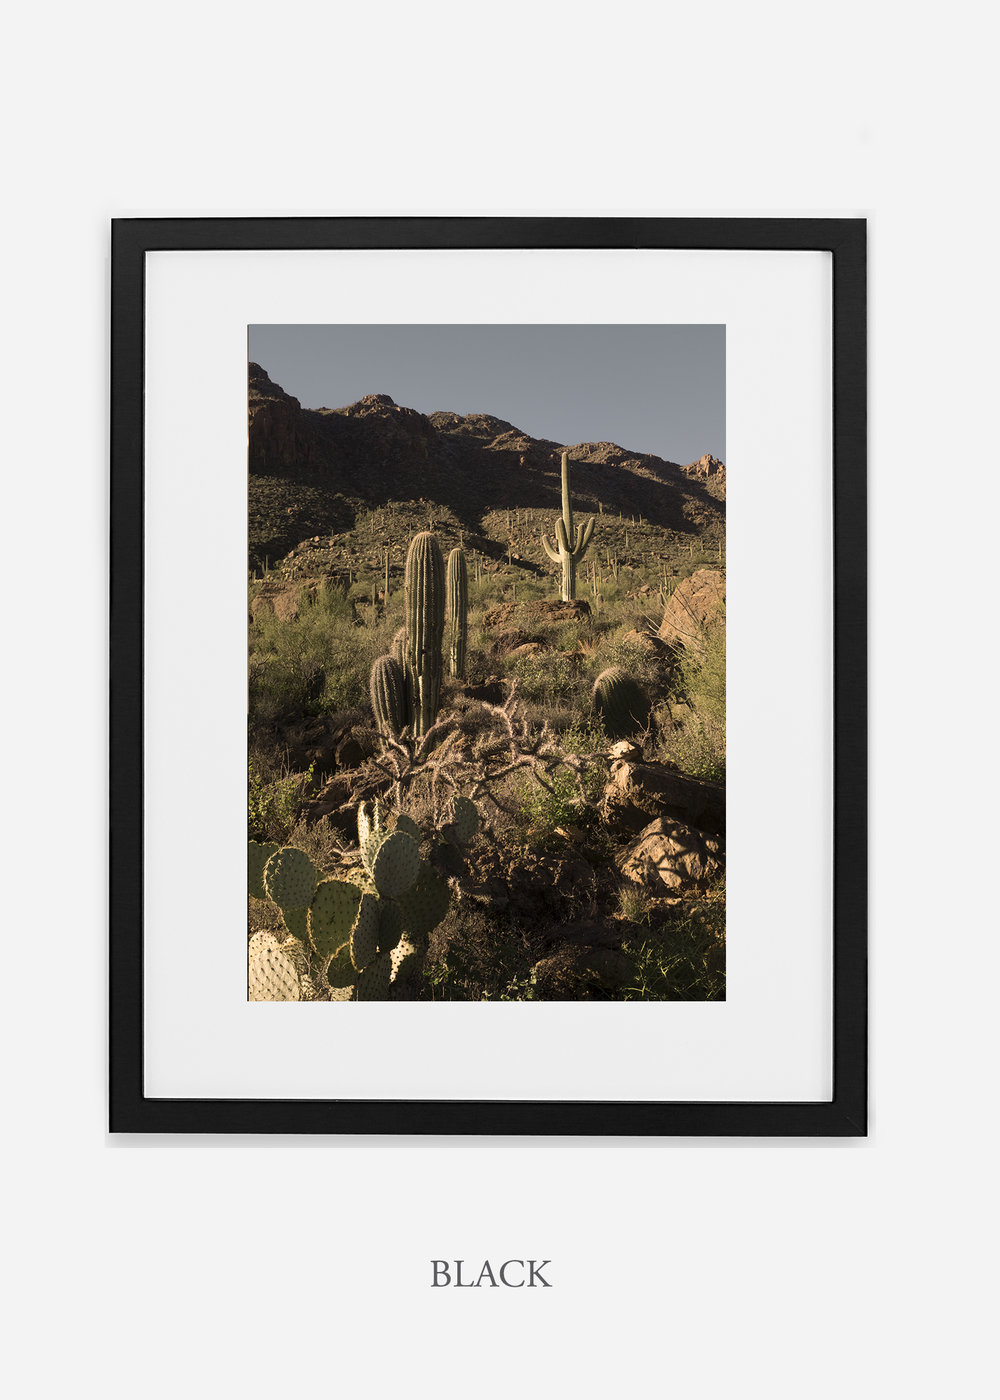 blackframe-saguaroNo.18-wildercalifornia-art-wallart-cactusprint-homedecor-prints-arizona-botanical-artwork-interiordesign.jpg